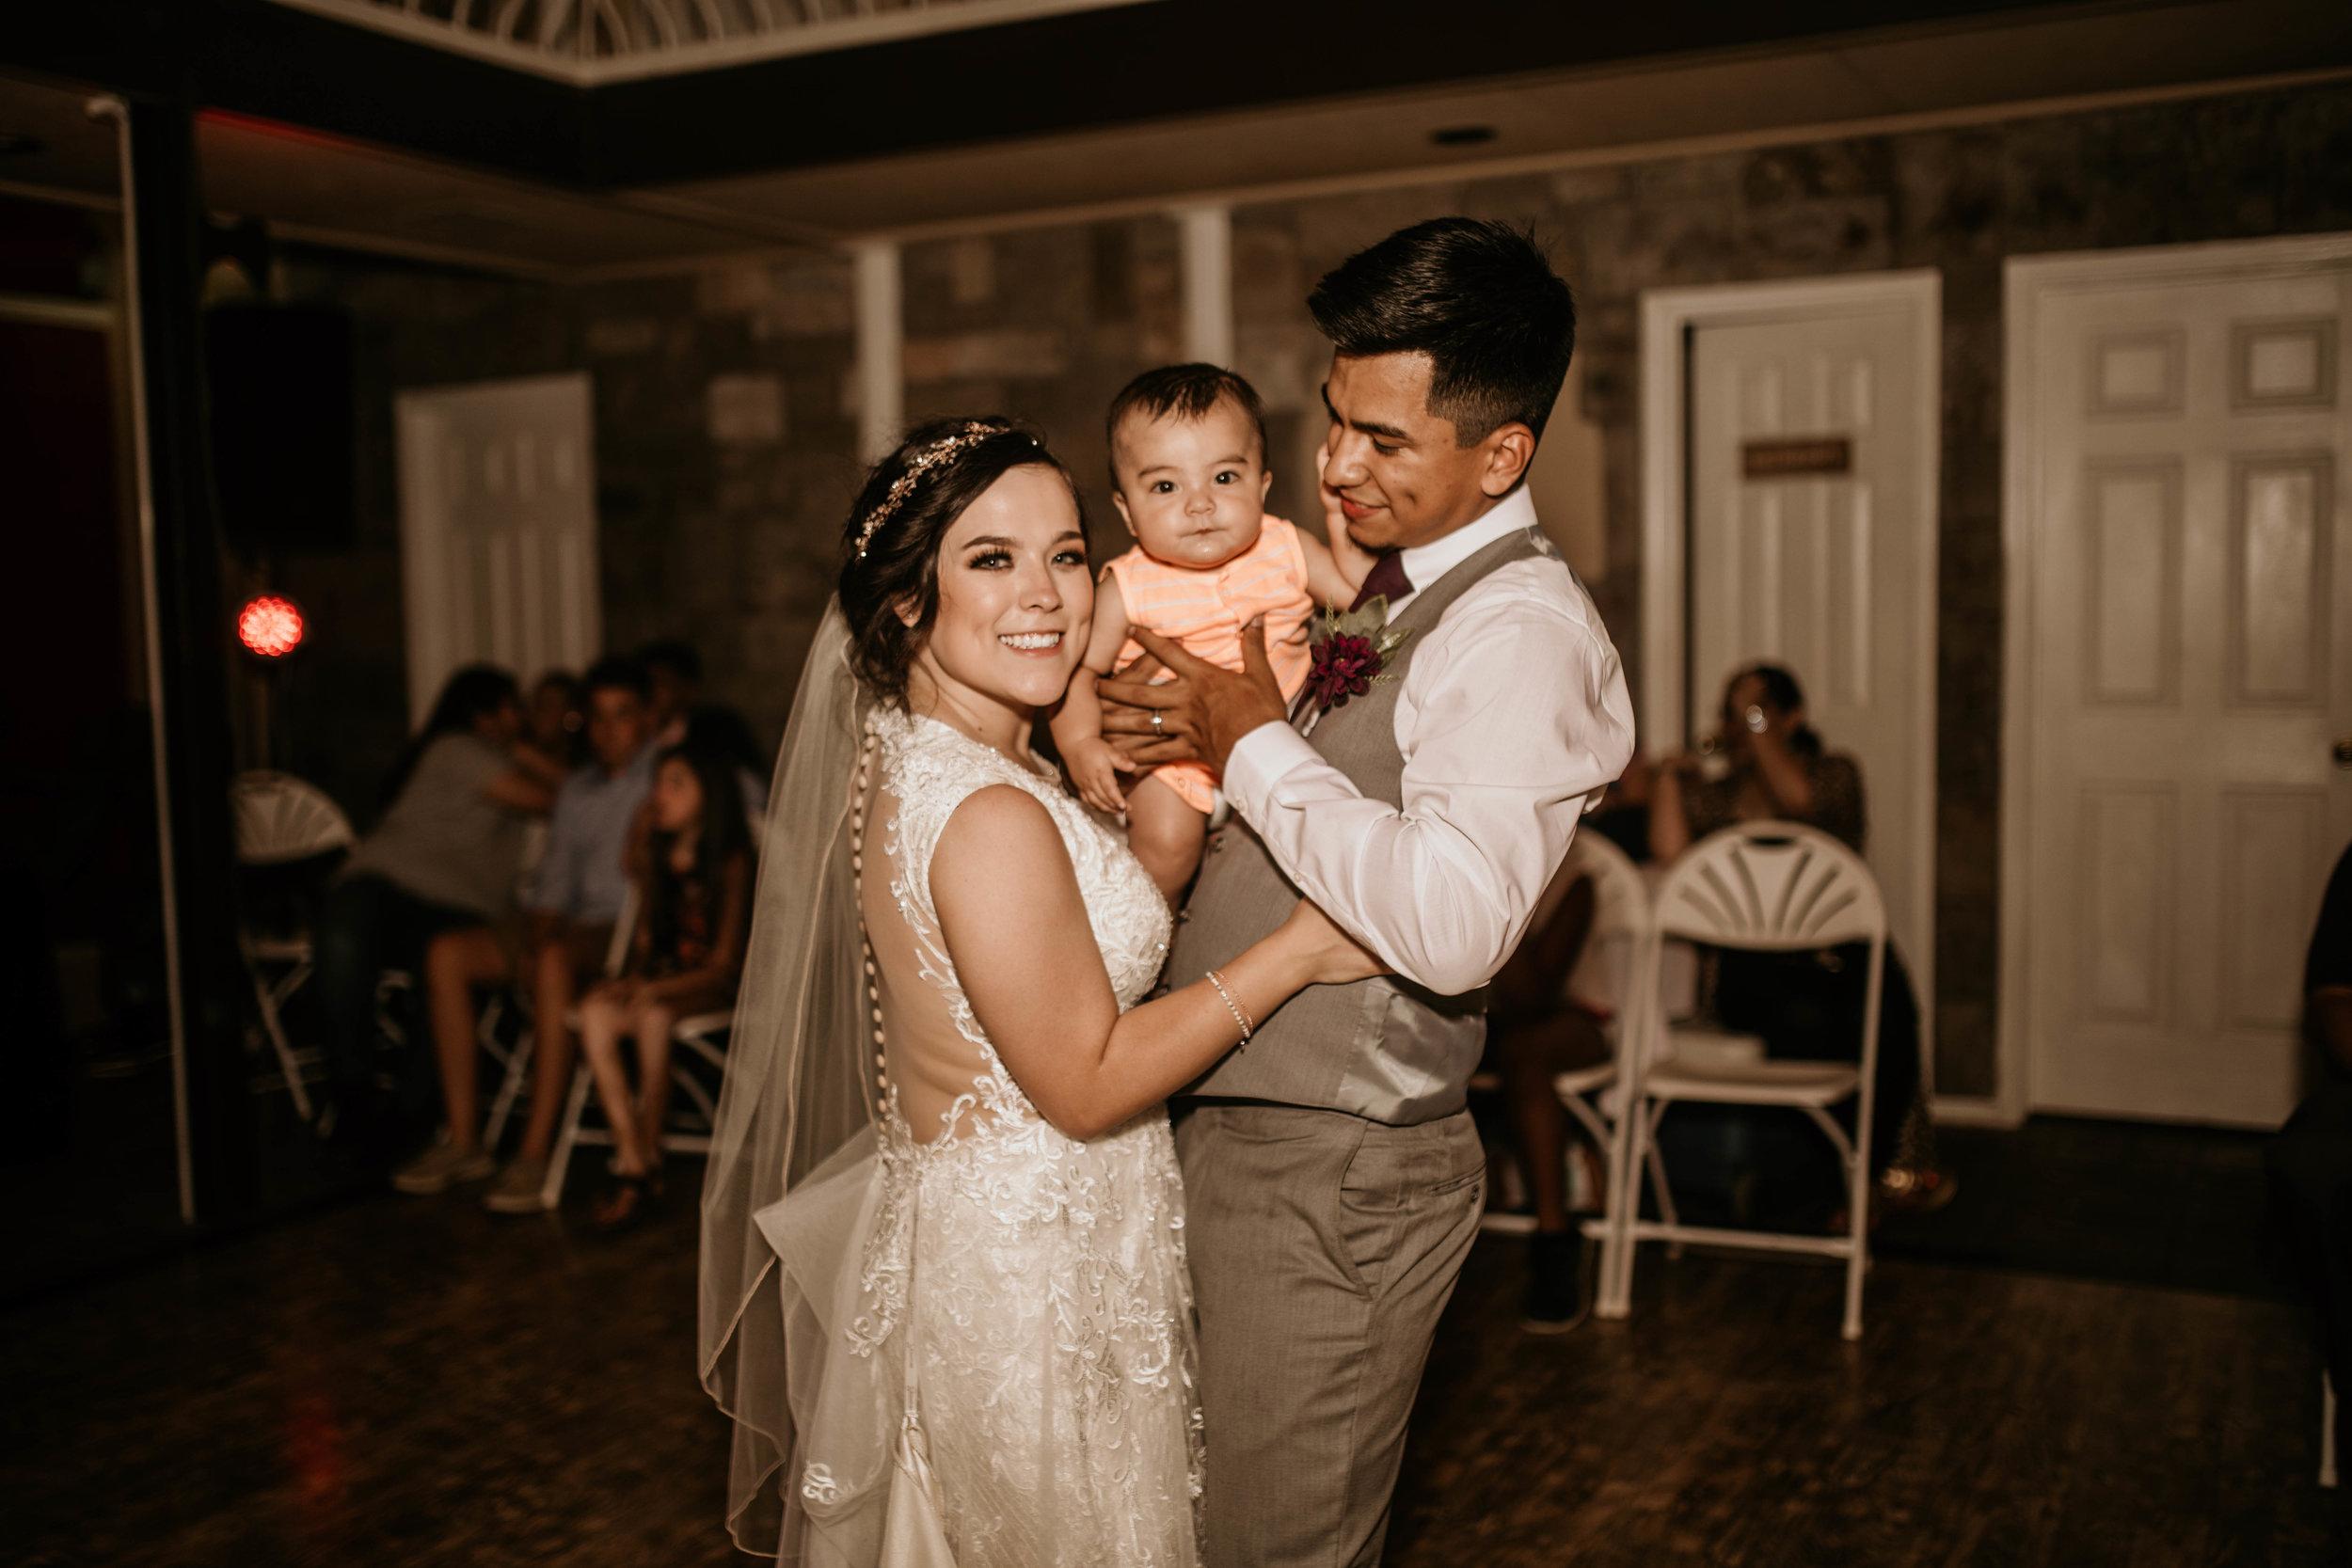 Lubbock,Texas WeddingDM7A1660.jpg